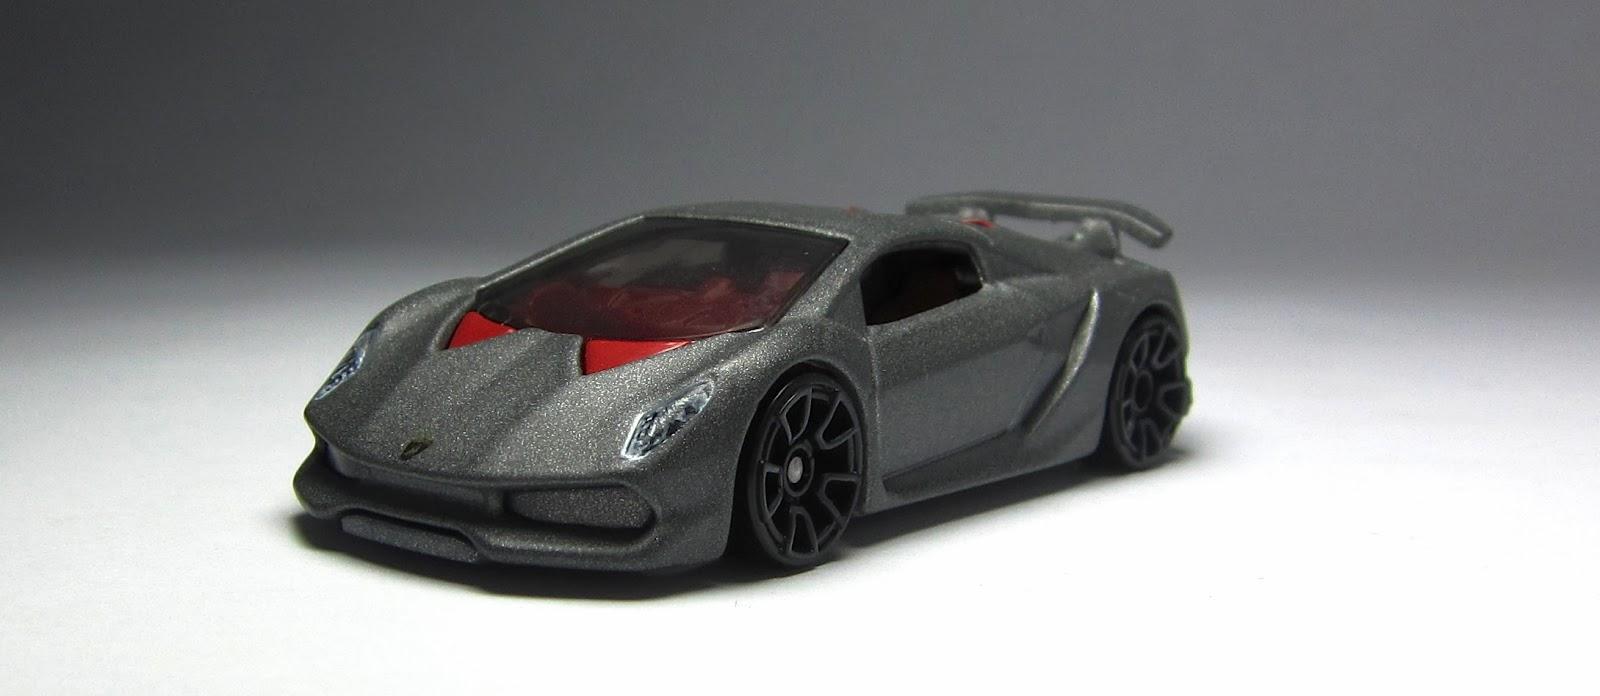 Sesto Elemento Hot Wheels Hot Wheels Lamborghini Sesto